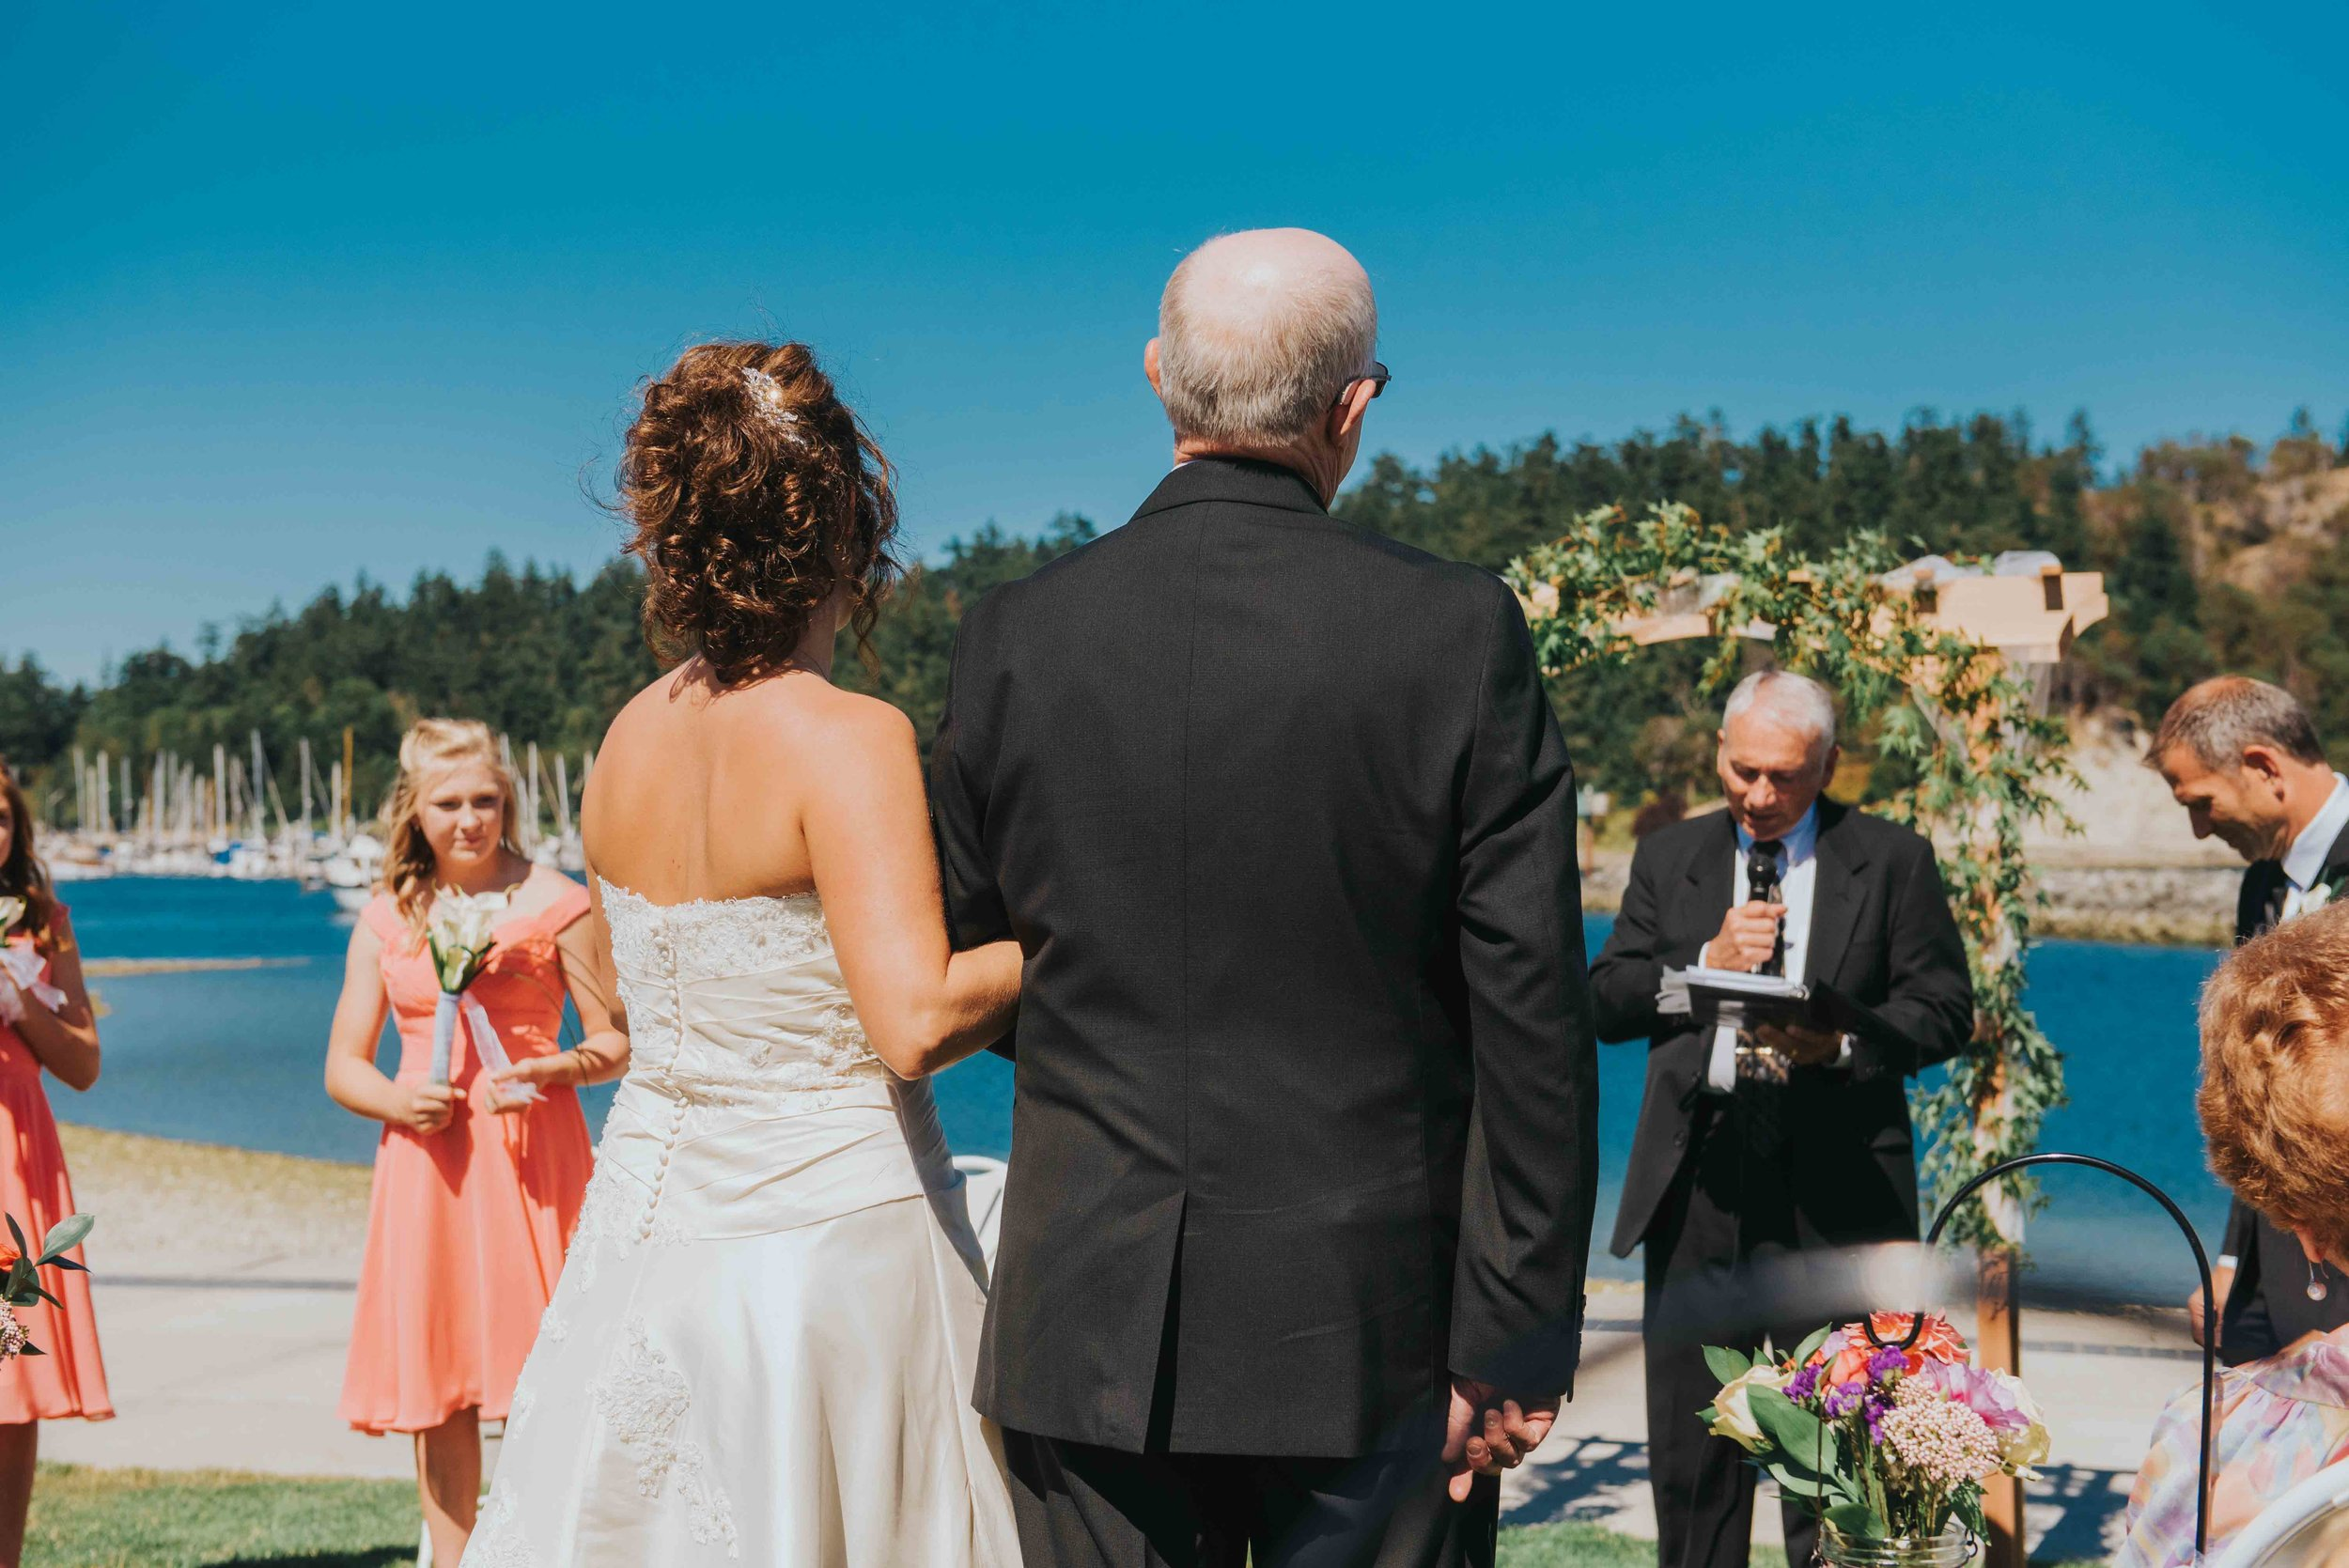 Cap-Sante-Wedding-J-Hodges-Anacortes-34.jpg